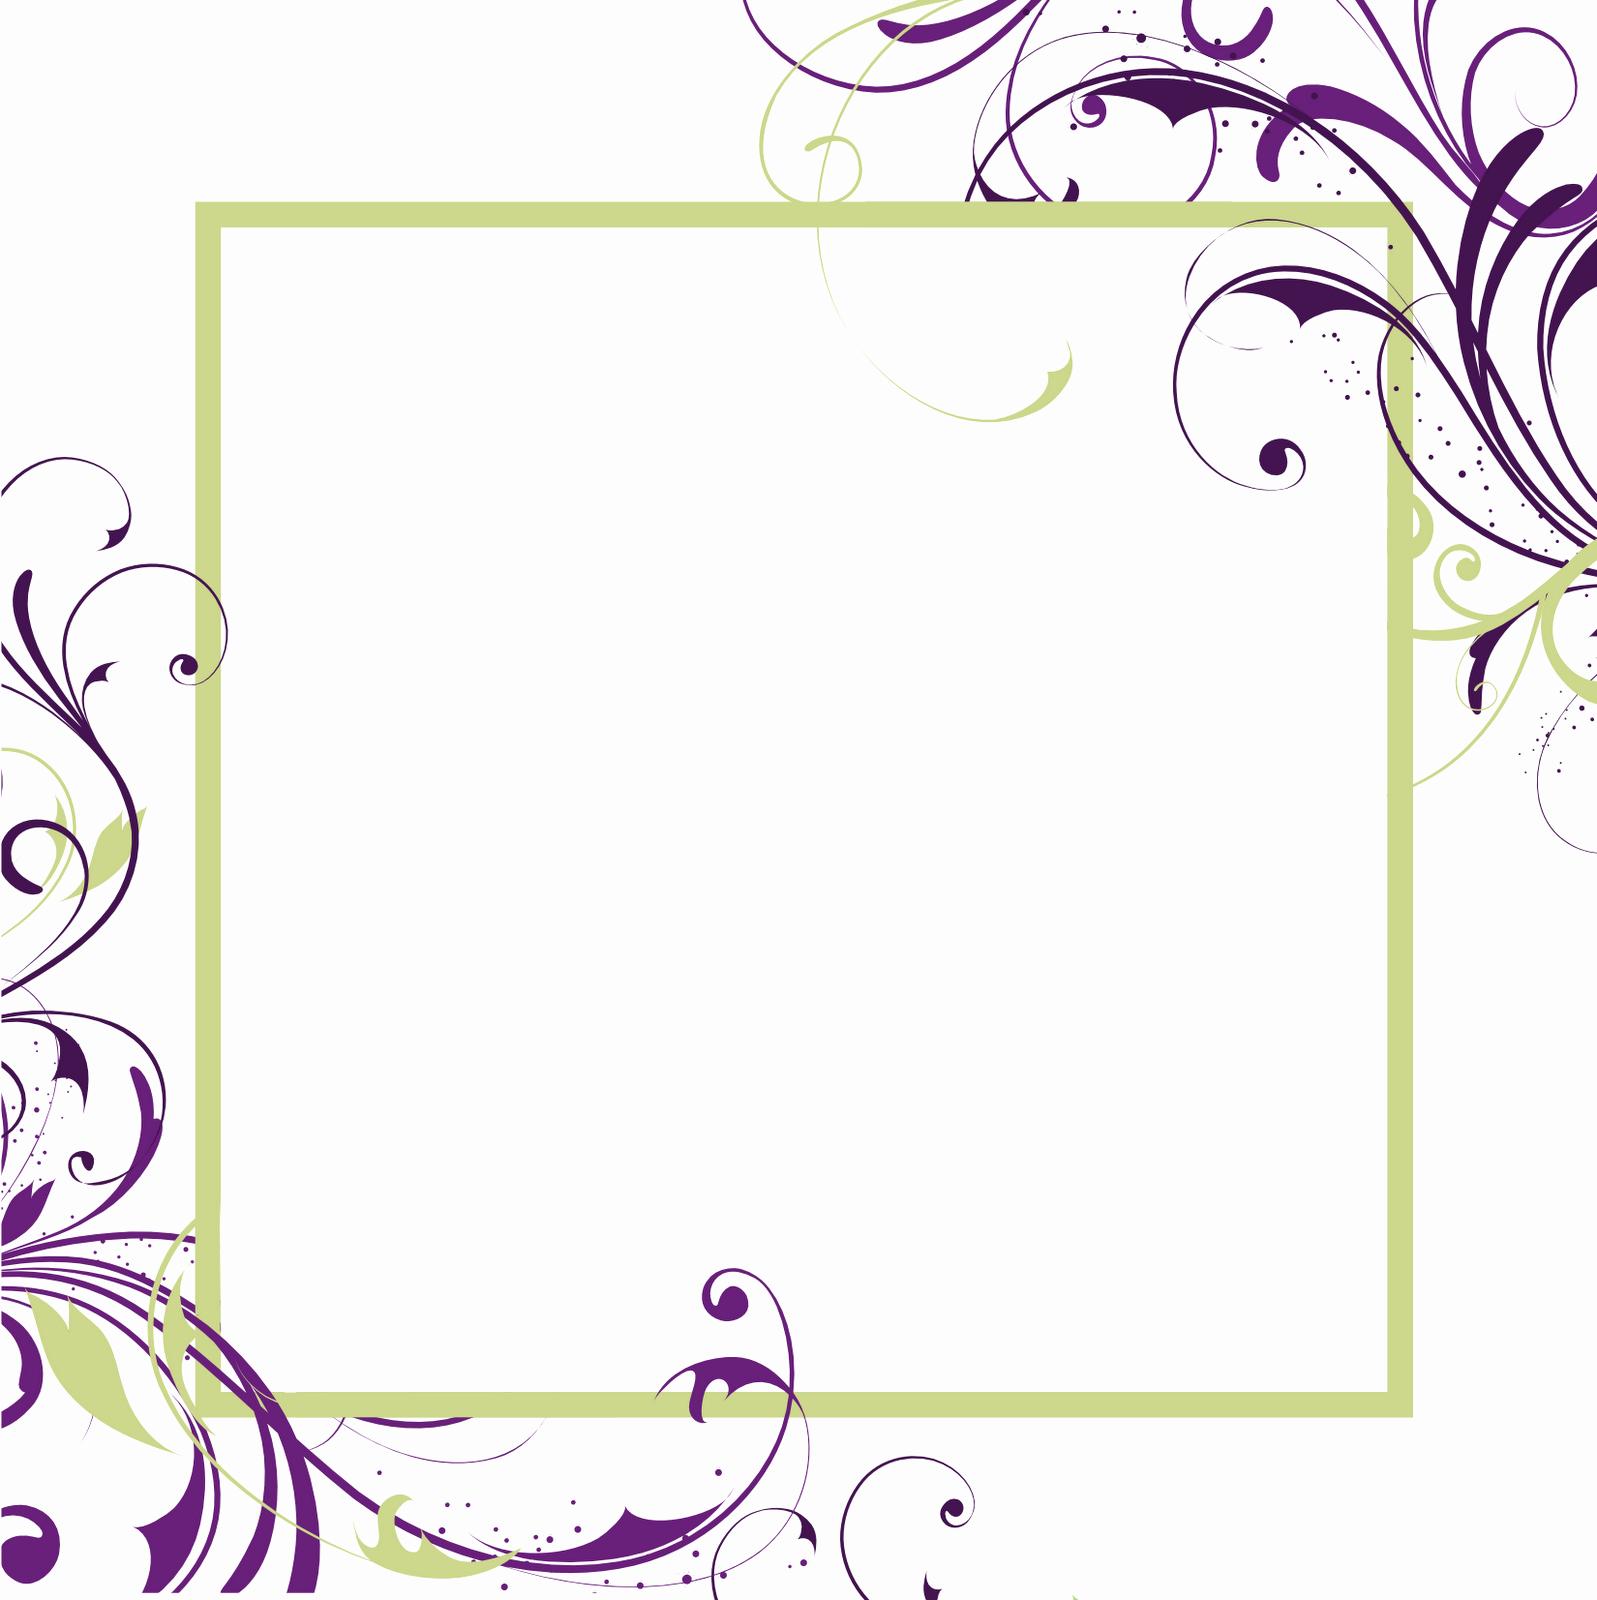 Free Printable Invitation Templates Unique Free Printable Blank Invitations Templates